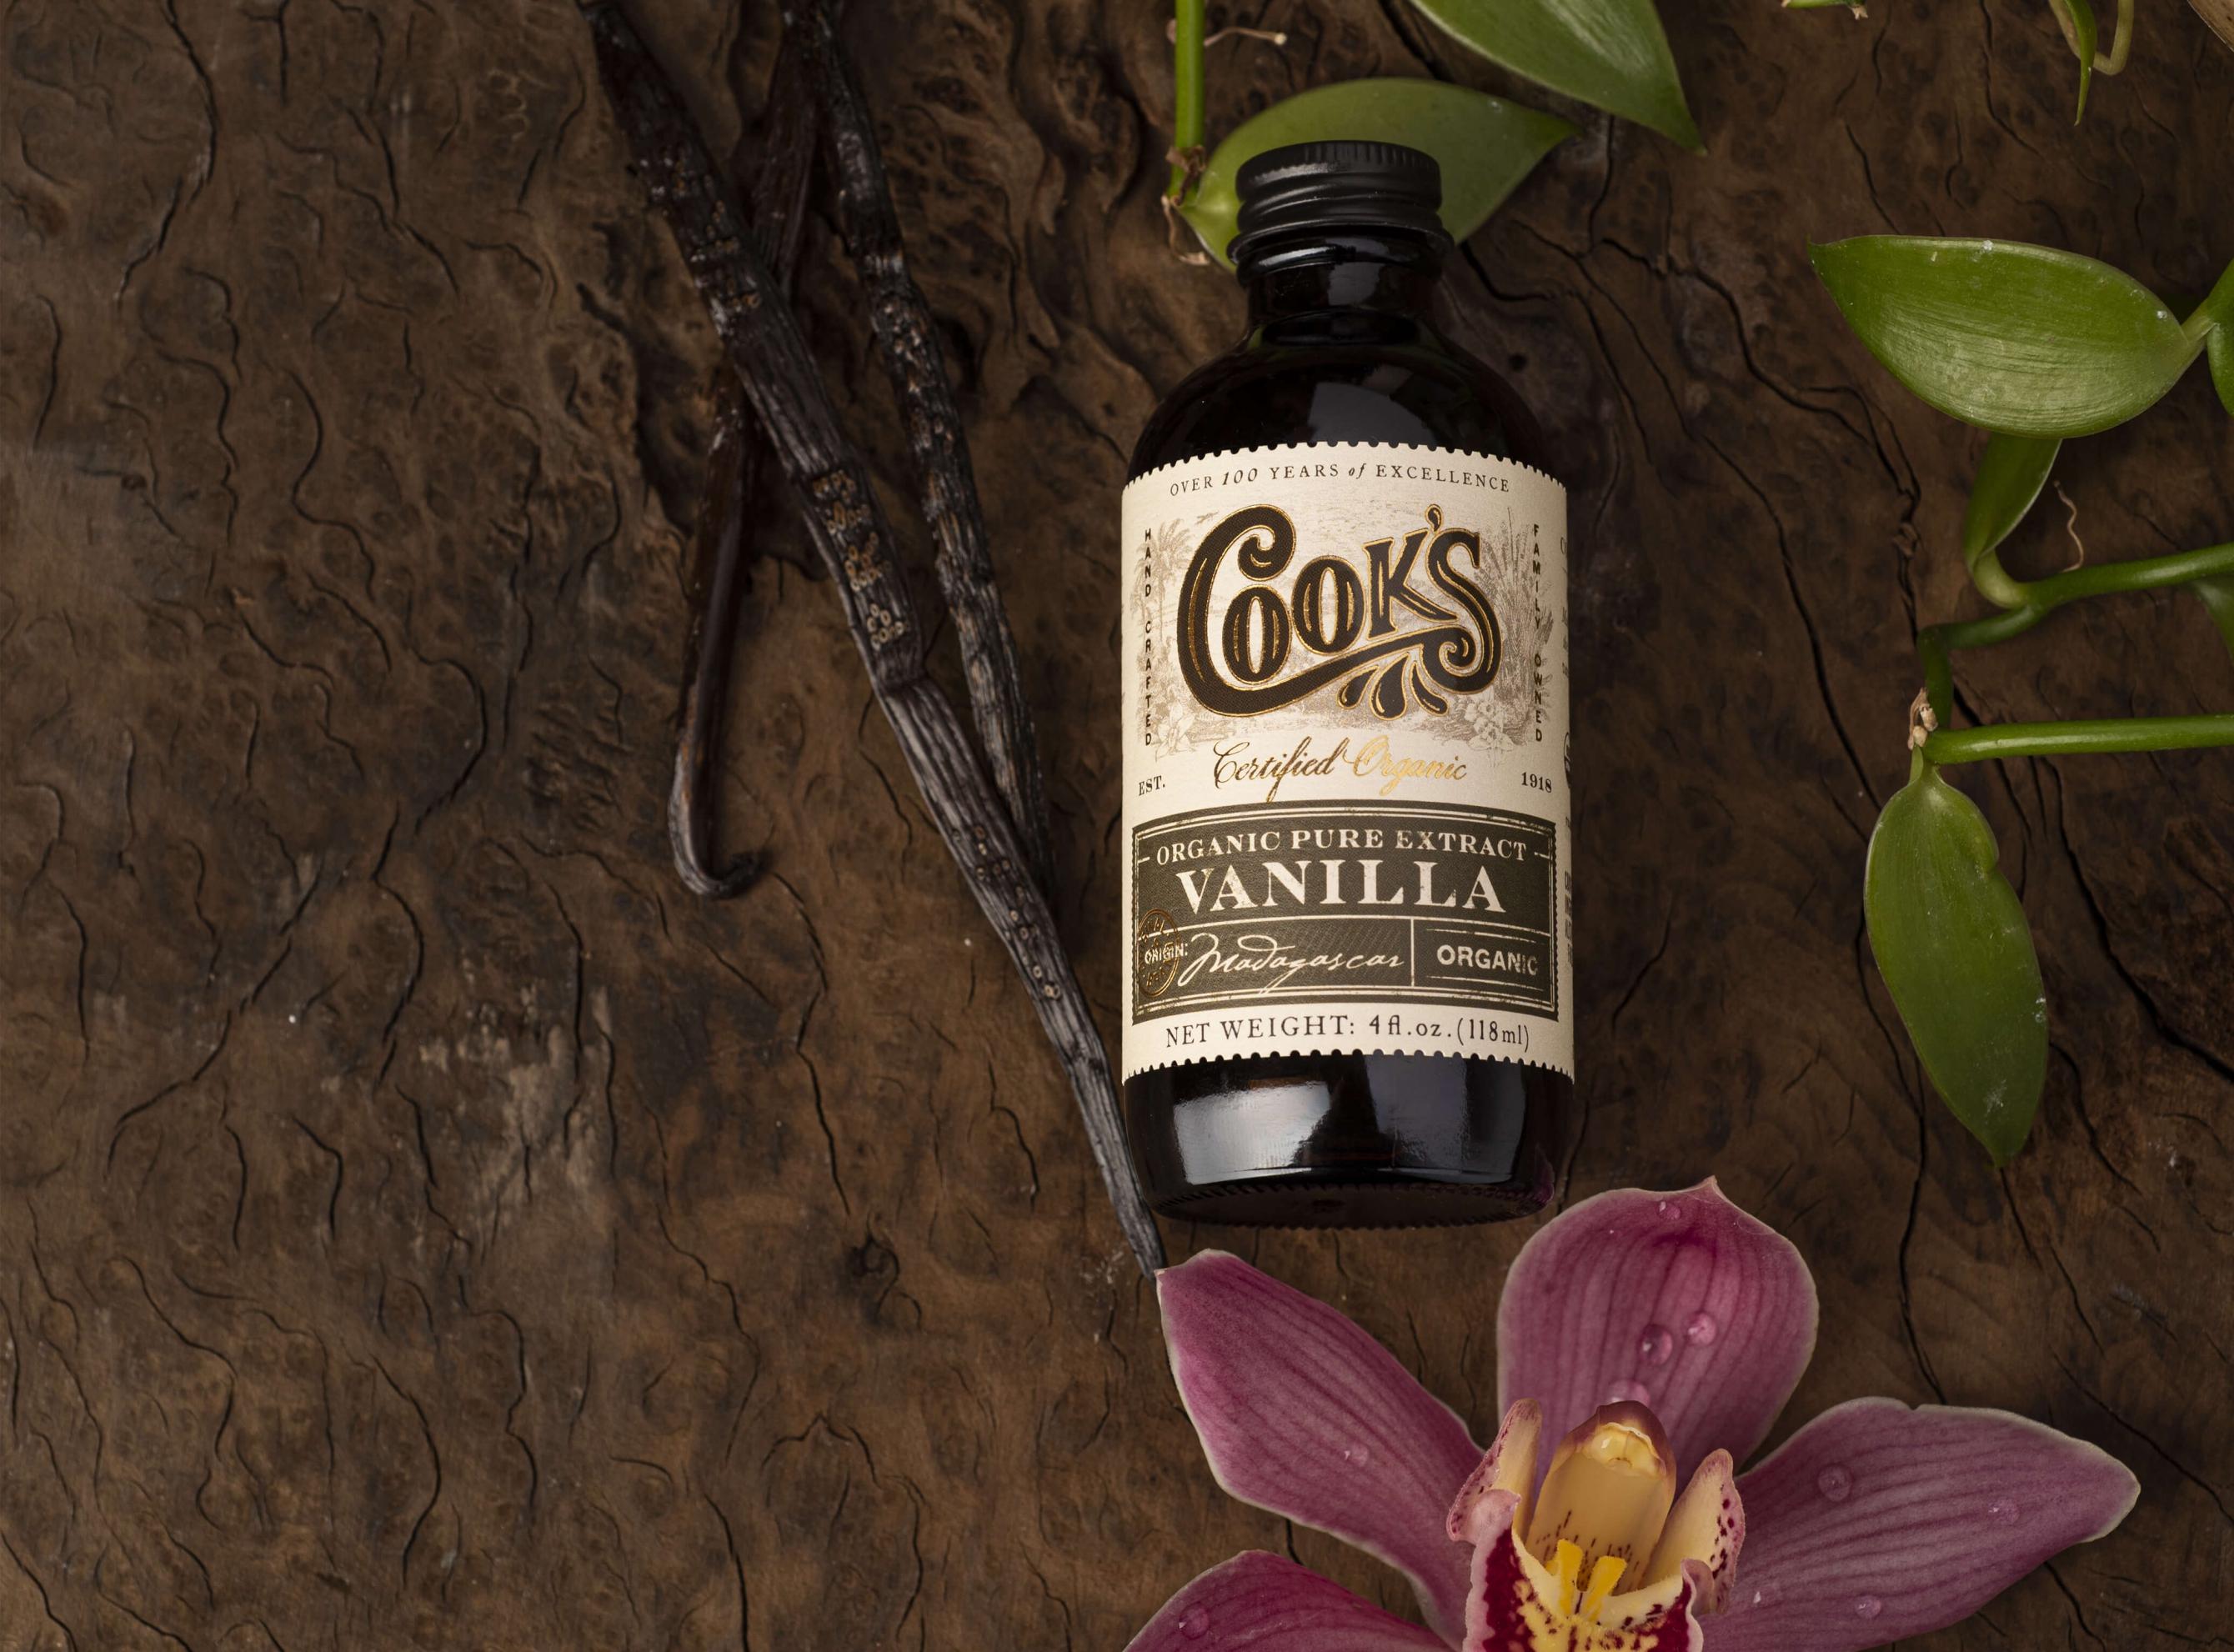 Organic Vanilla & Flavorings